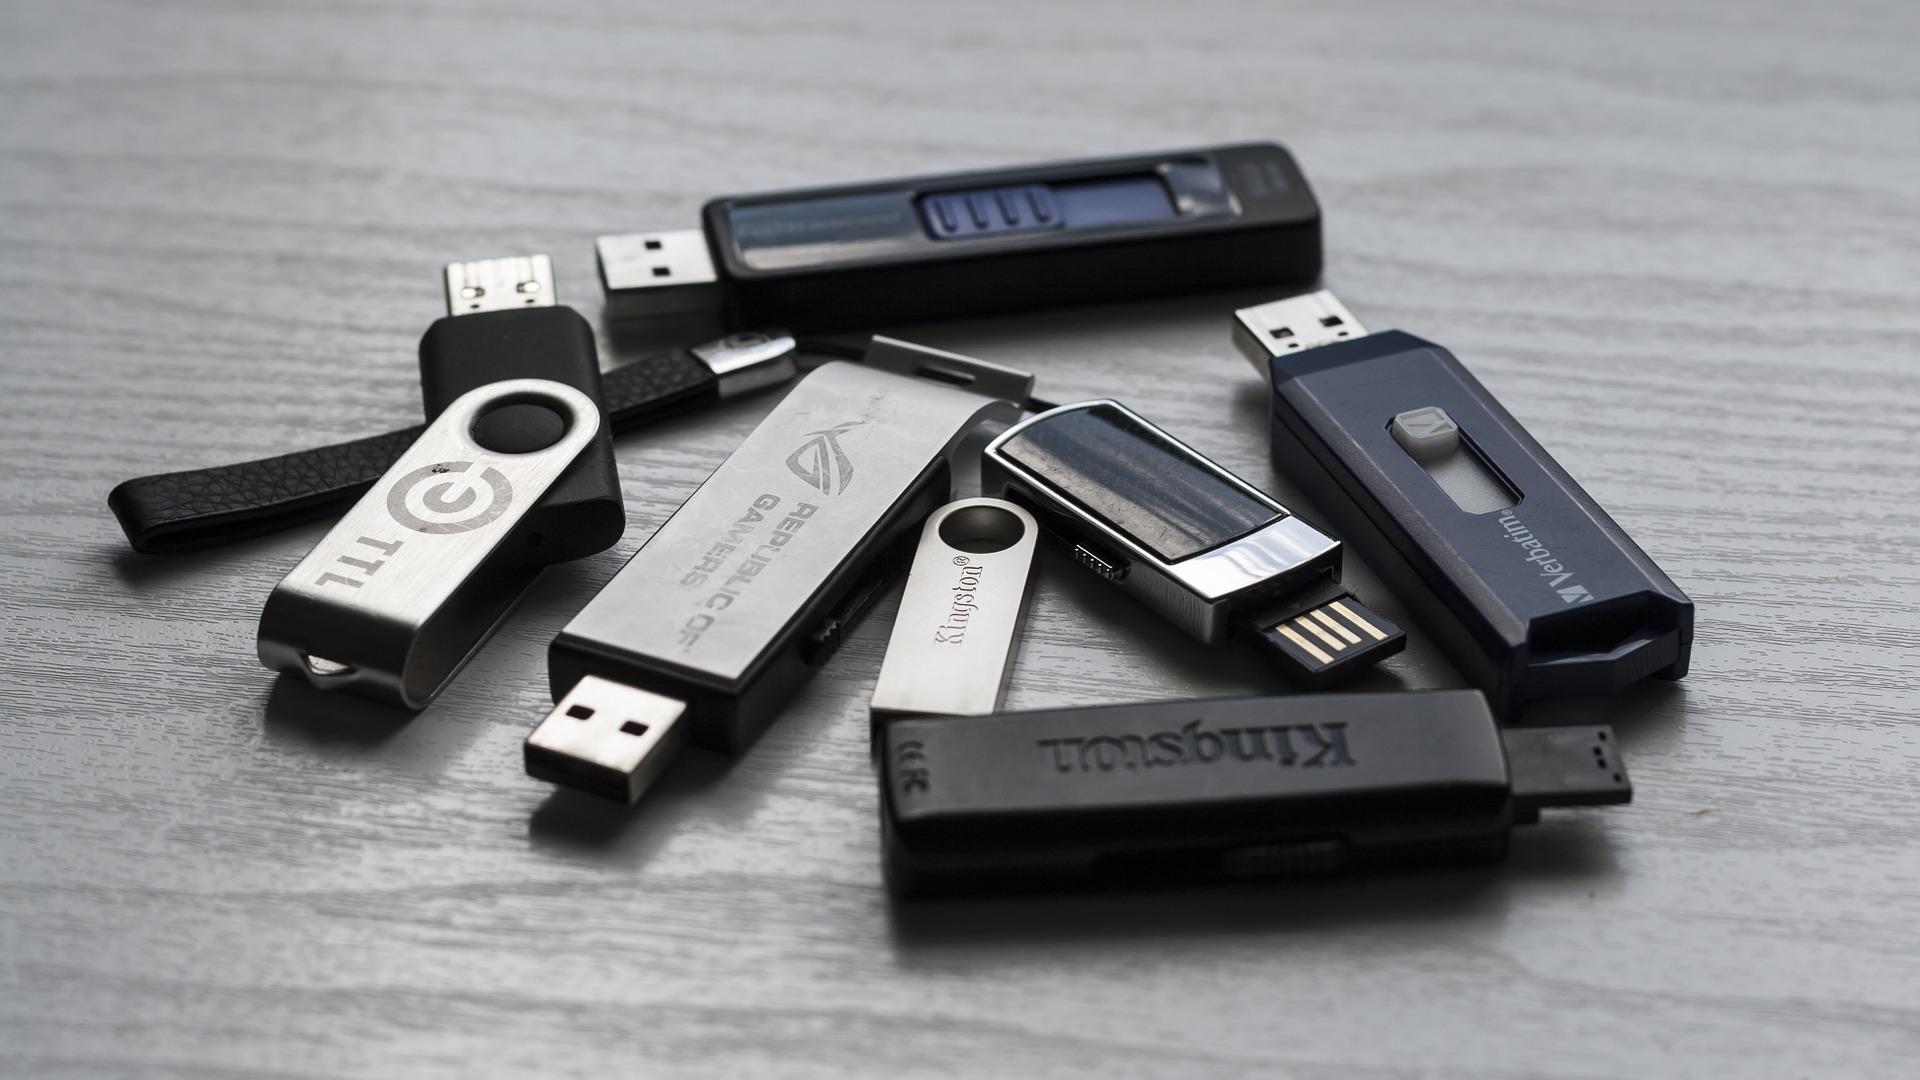 memory-stick-1267620_1920